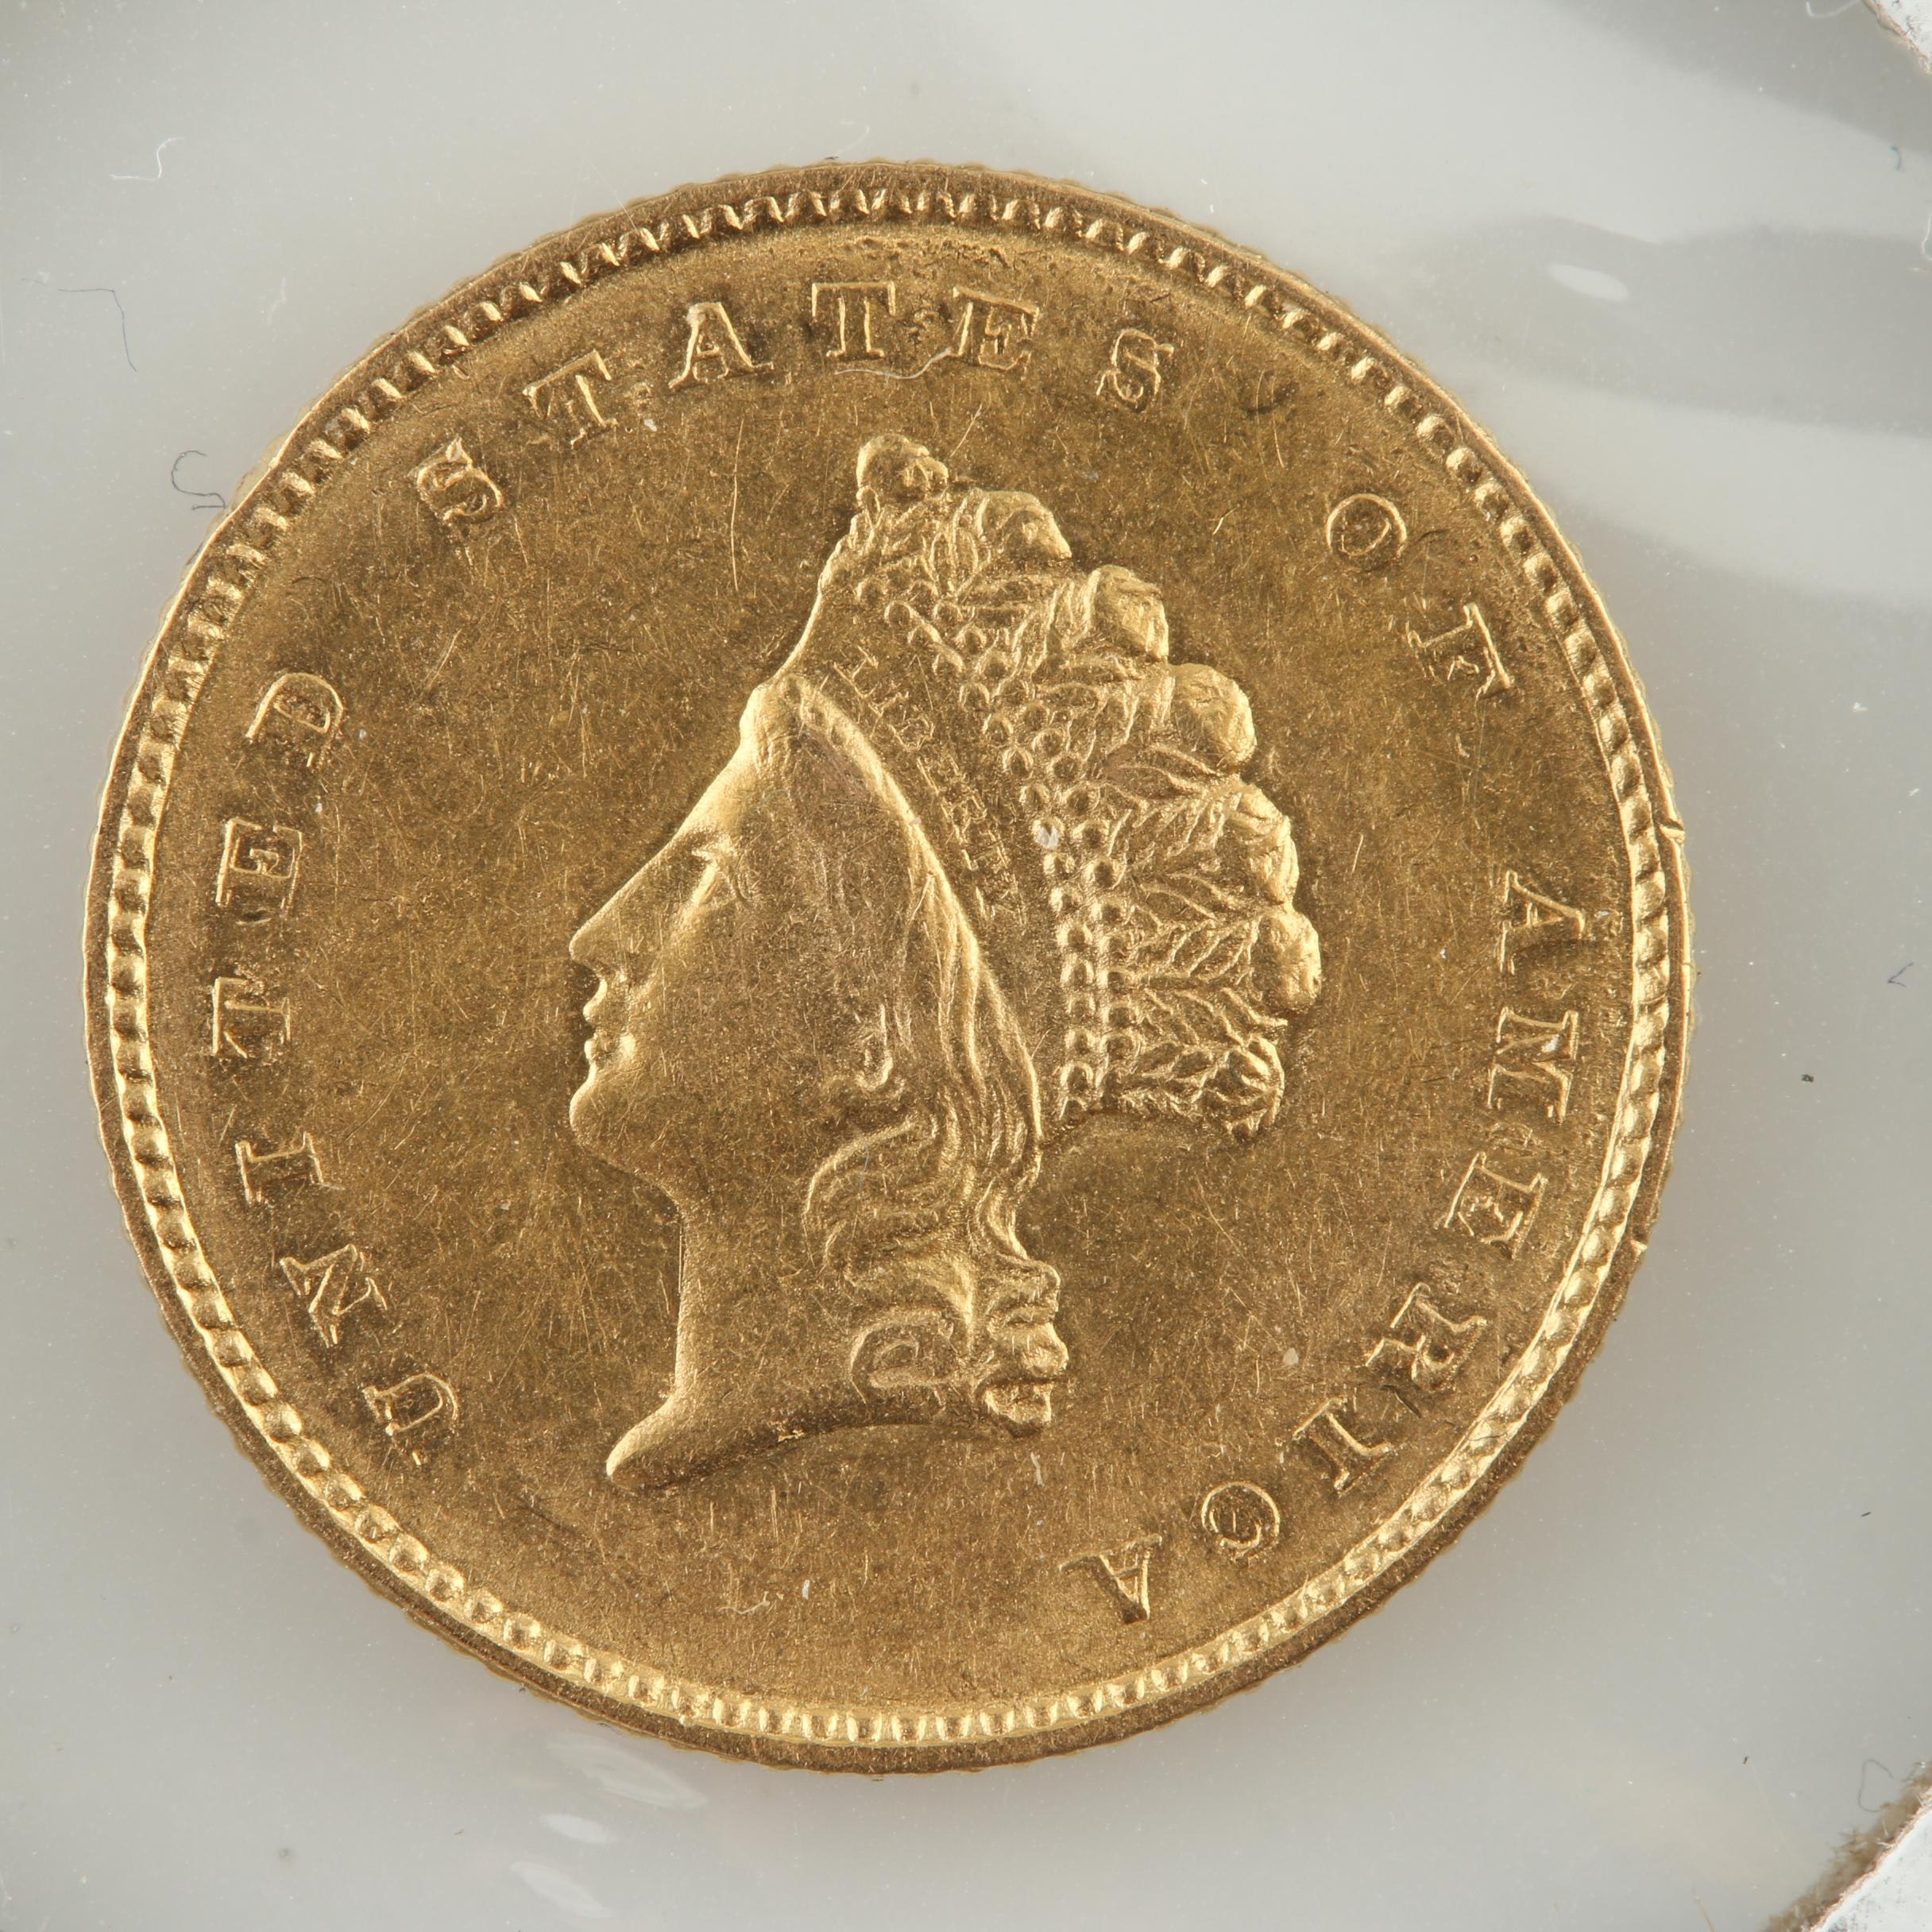 Type II 1854 Indian Head Princess $1 Gold Coin